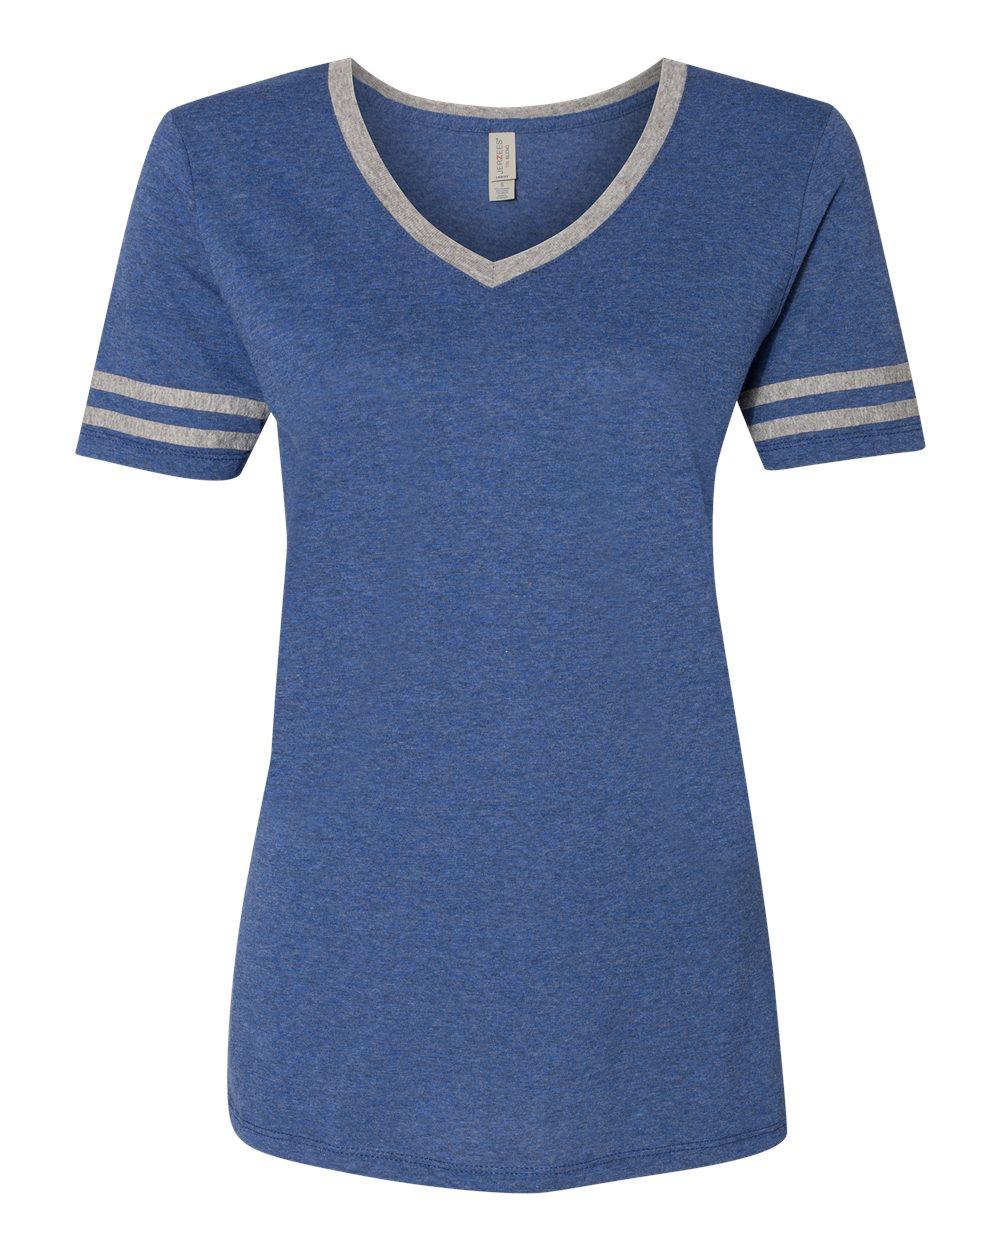 Jerzees-Triblend-Women-039-s-V-Neck-Varsity-T-Shirt-602WVR thumbnail 25